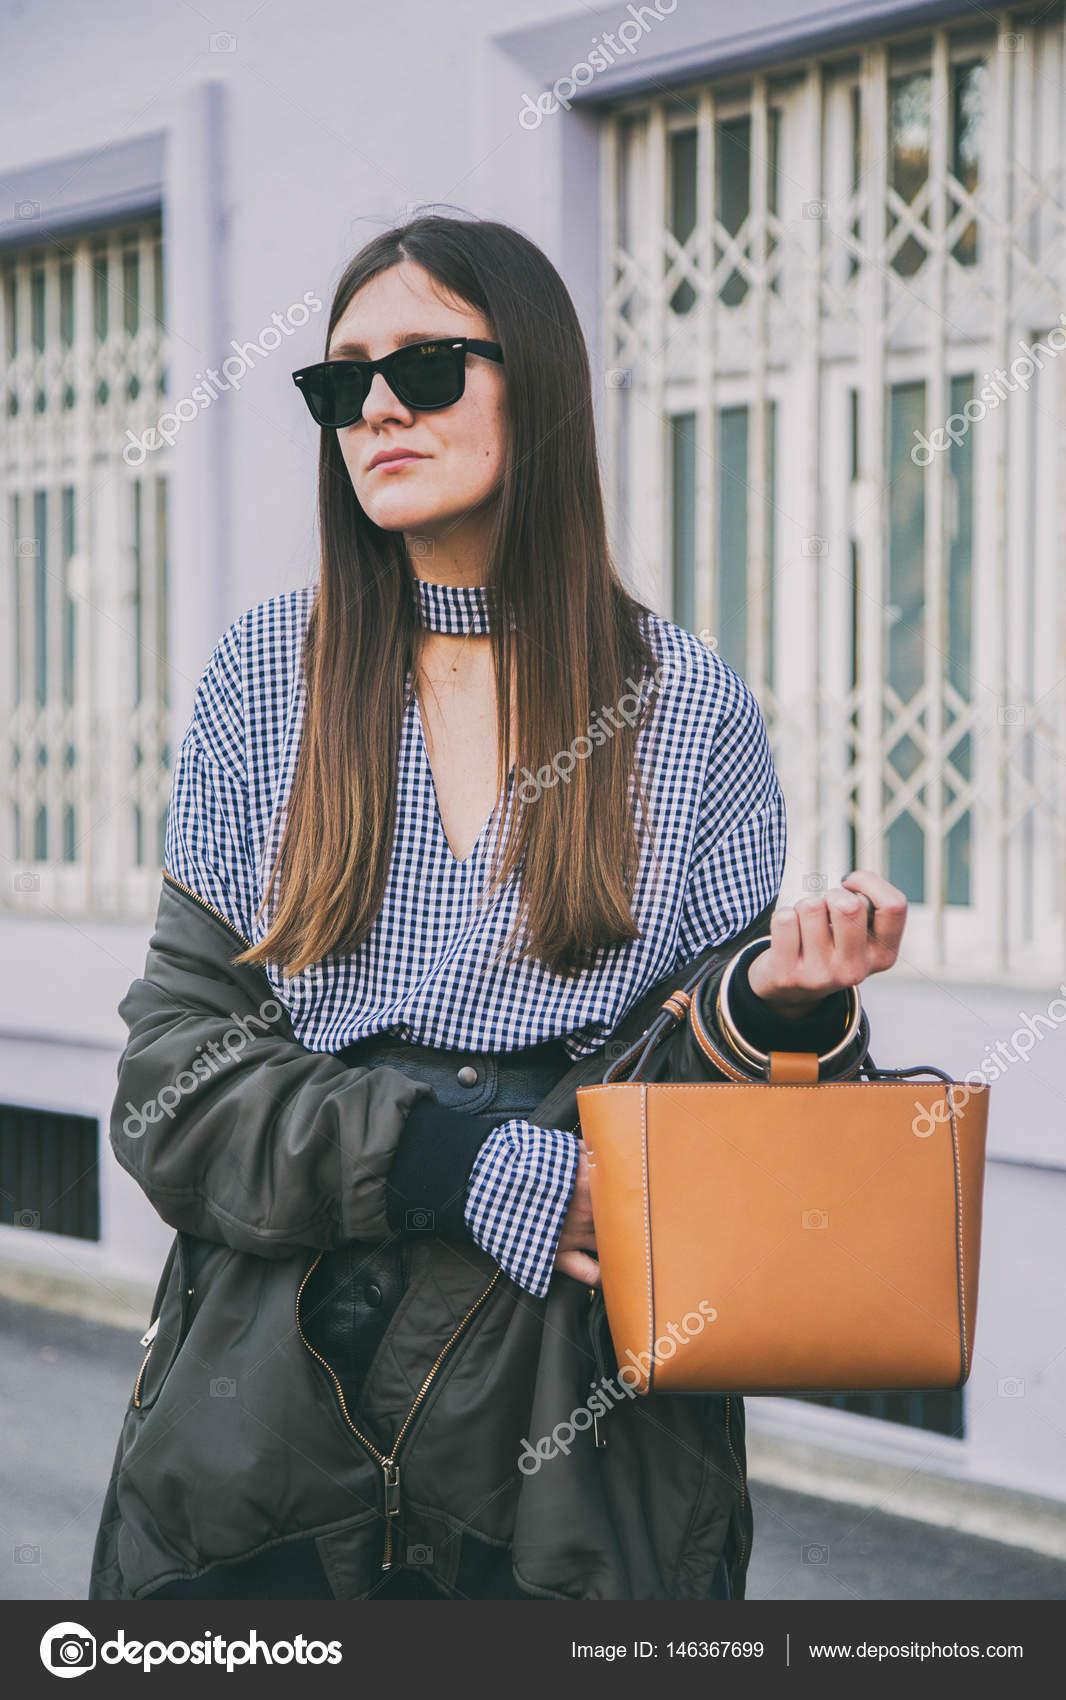 c15caeba95e fashionable young woman wearing sunglasses